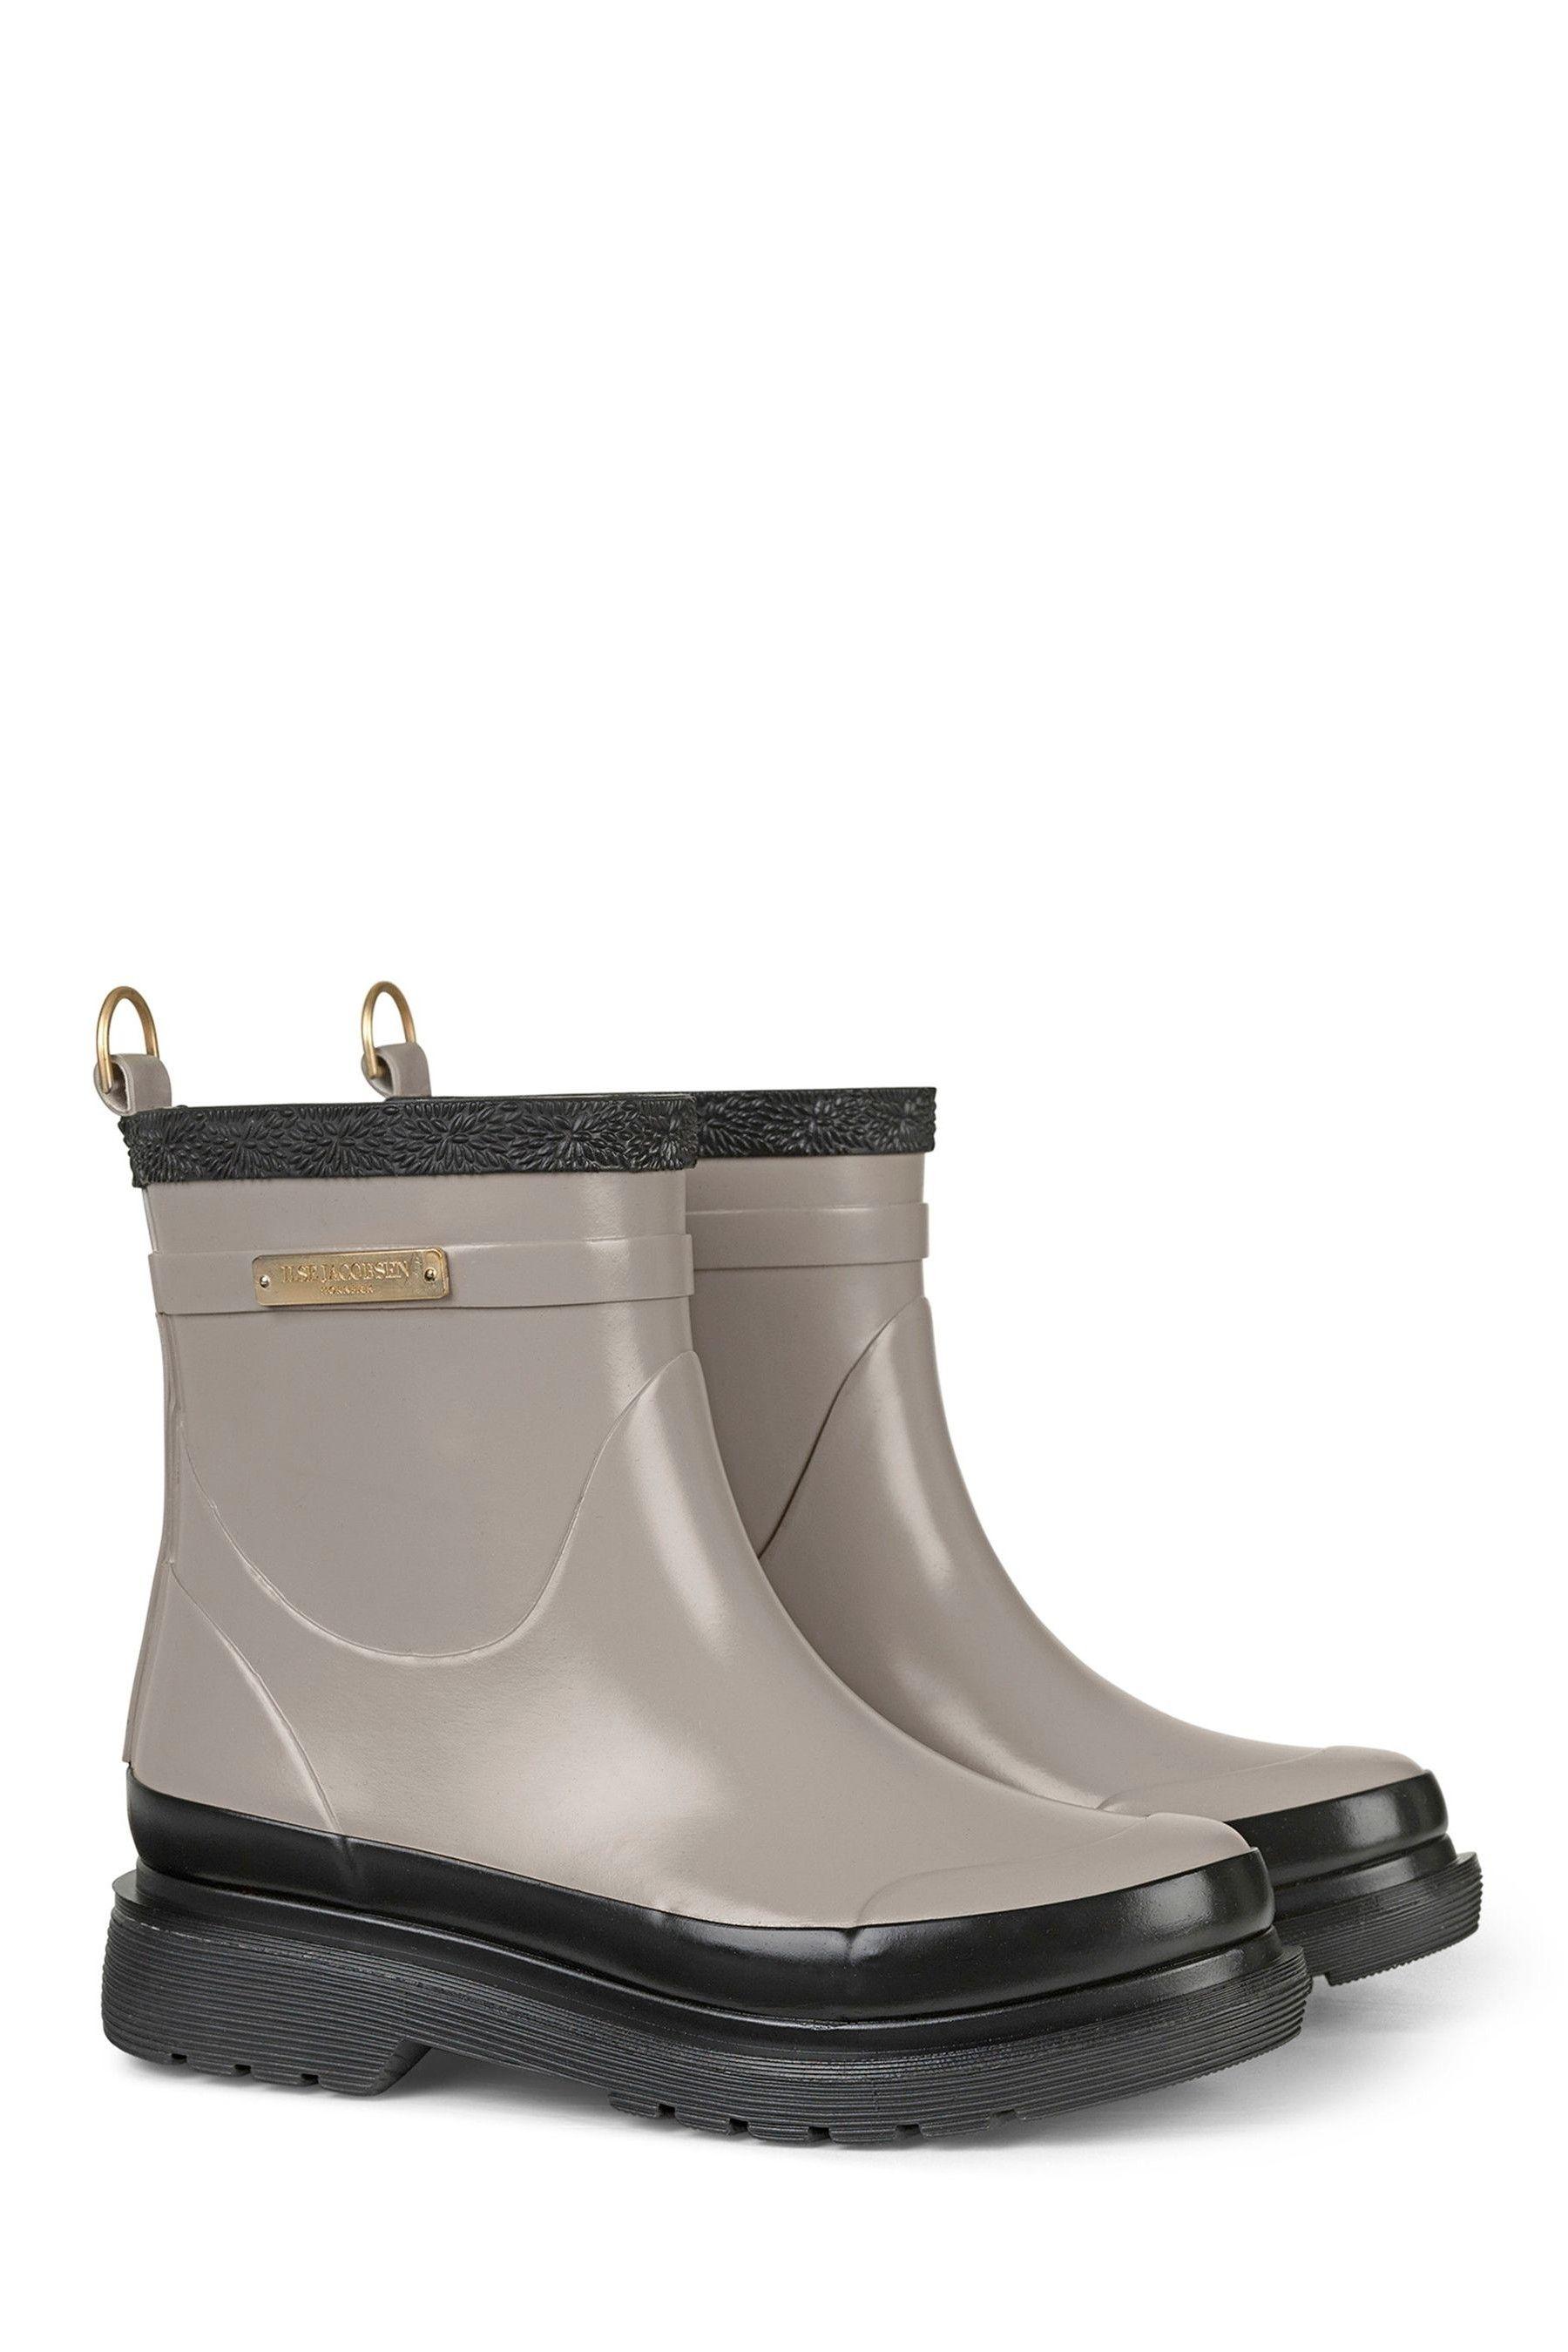 Ilse Jacobsen RUB1 Tall Grey Womens Boots